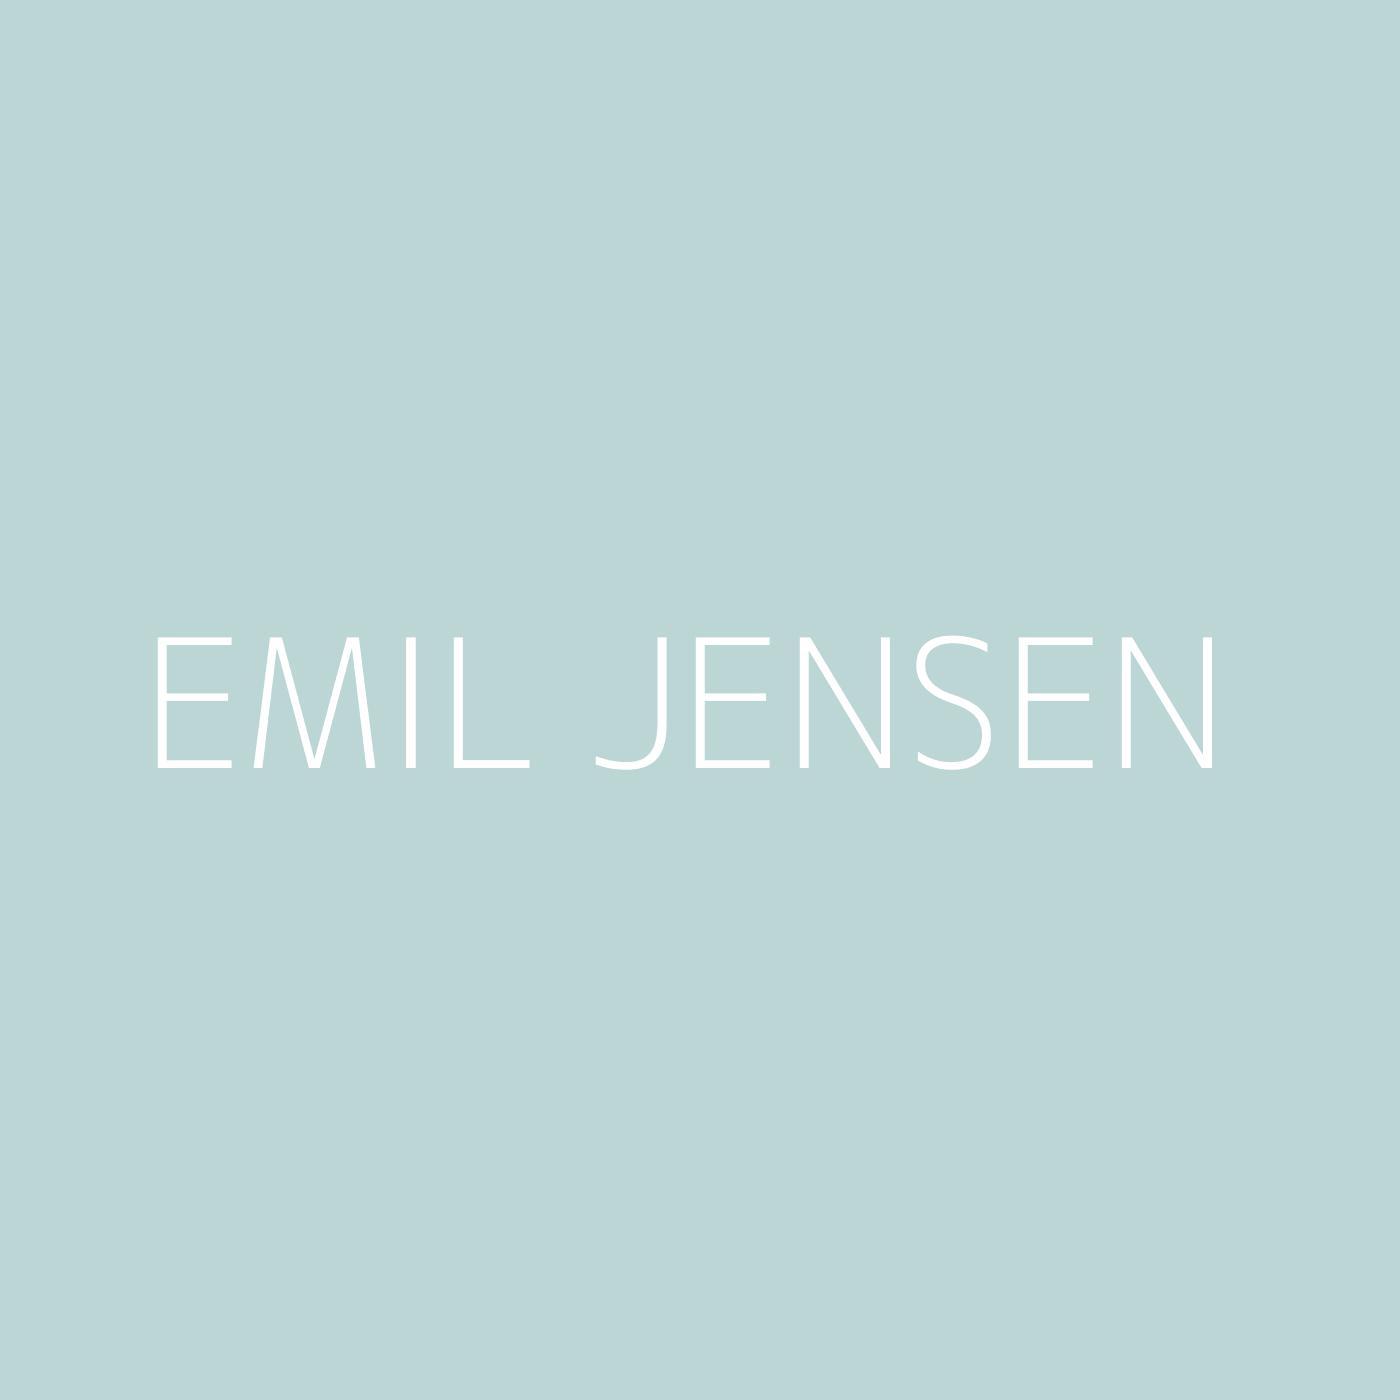 Emil Jensen Playlist Artwork